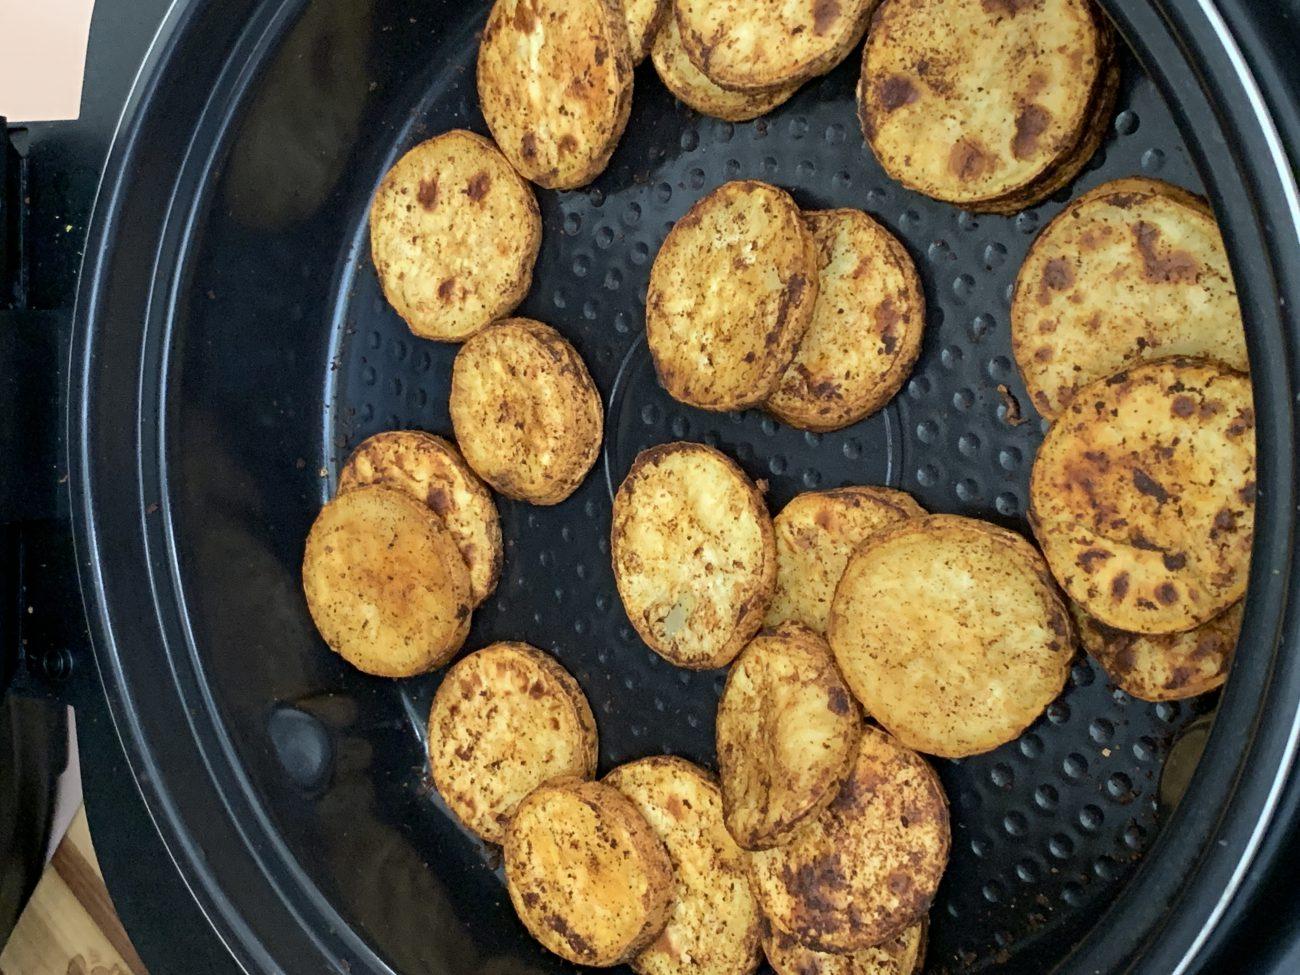 Cinnamon and Chipotle Sweet Potatoes